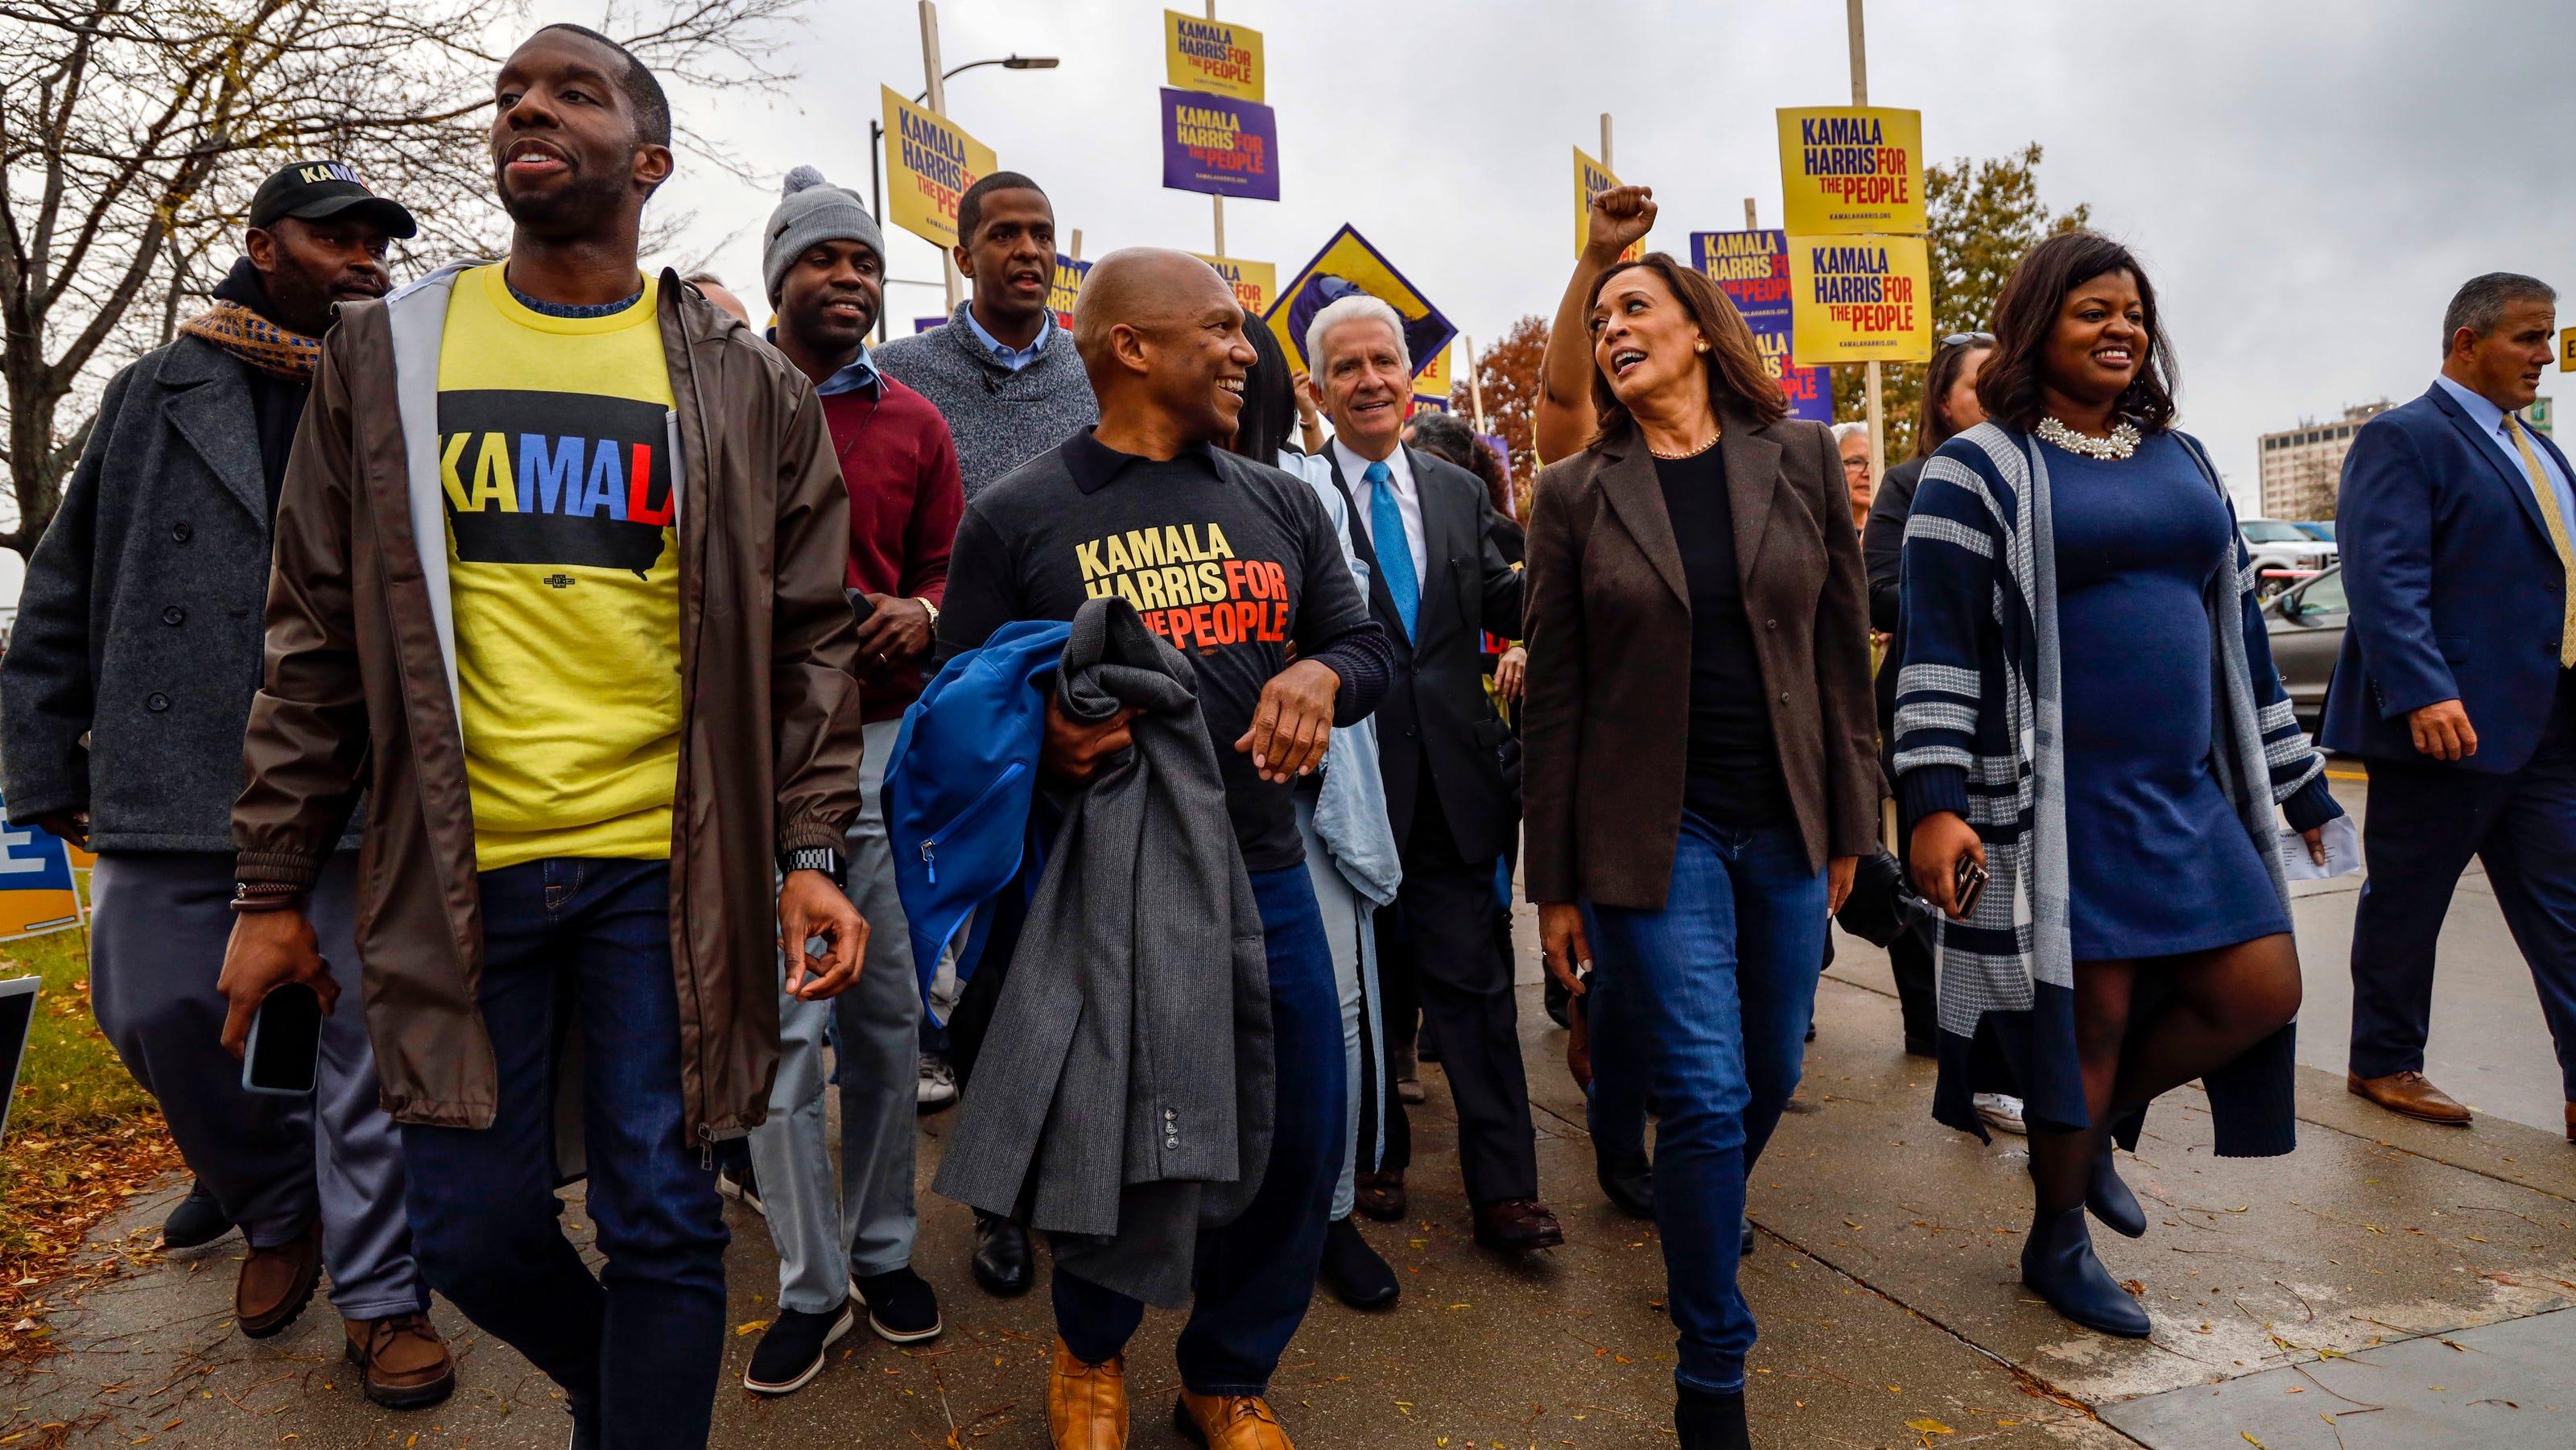 www.desmoinesregister.com: Kamala Harris' rise to vice president marks a new dawn in America